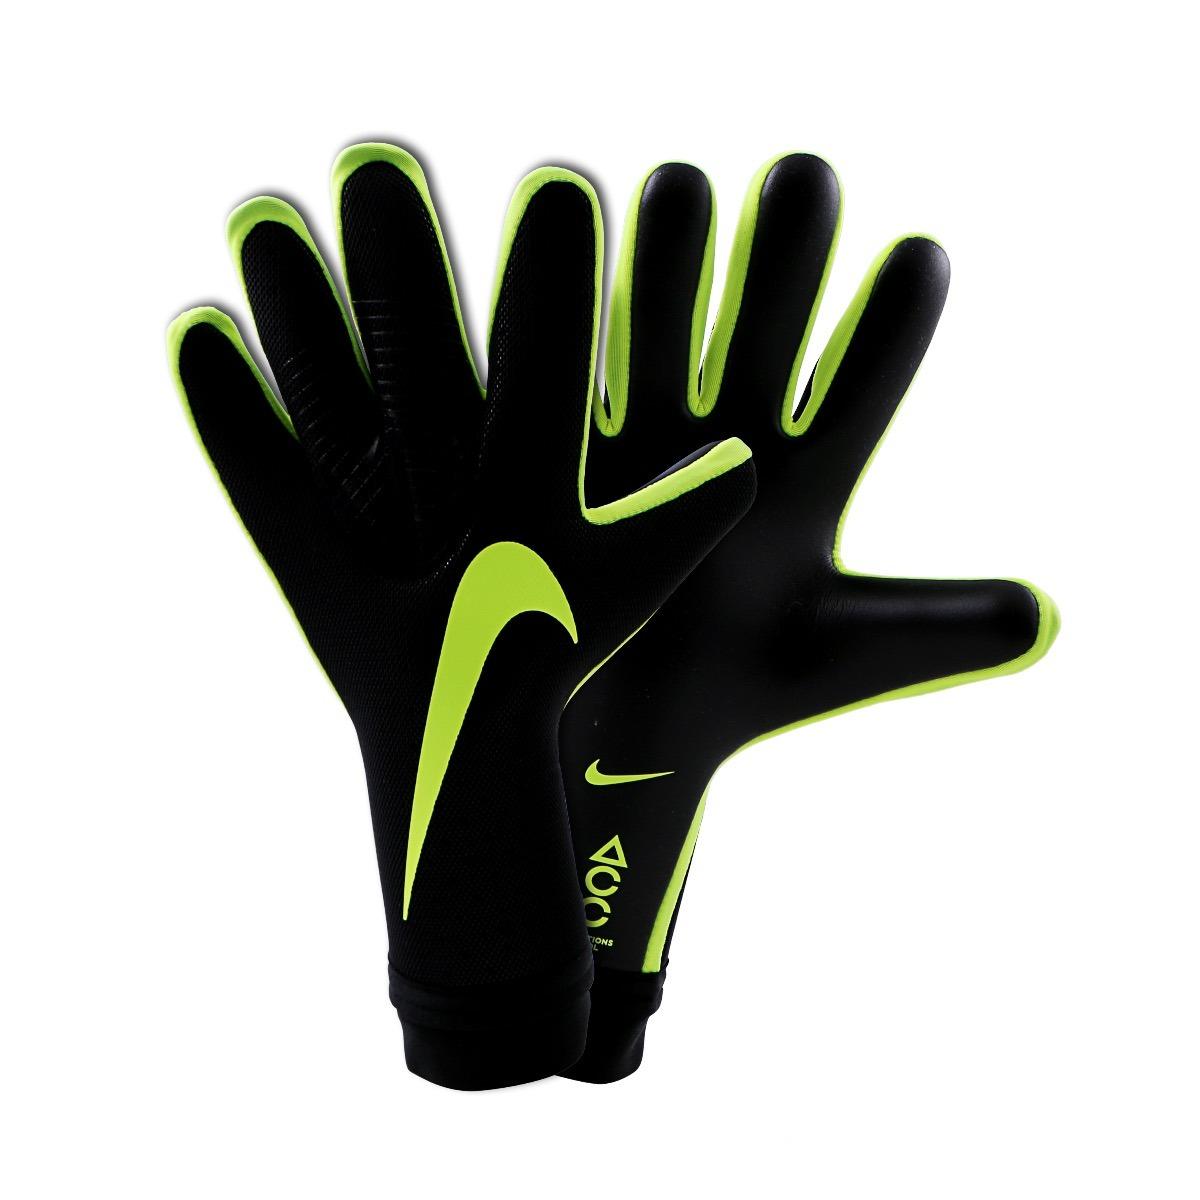 653308500a356 guantes de portero nike mercurial touch elite. Cargando zoom.